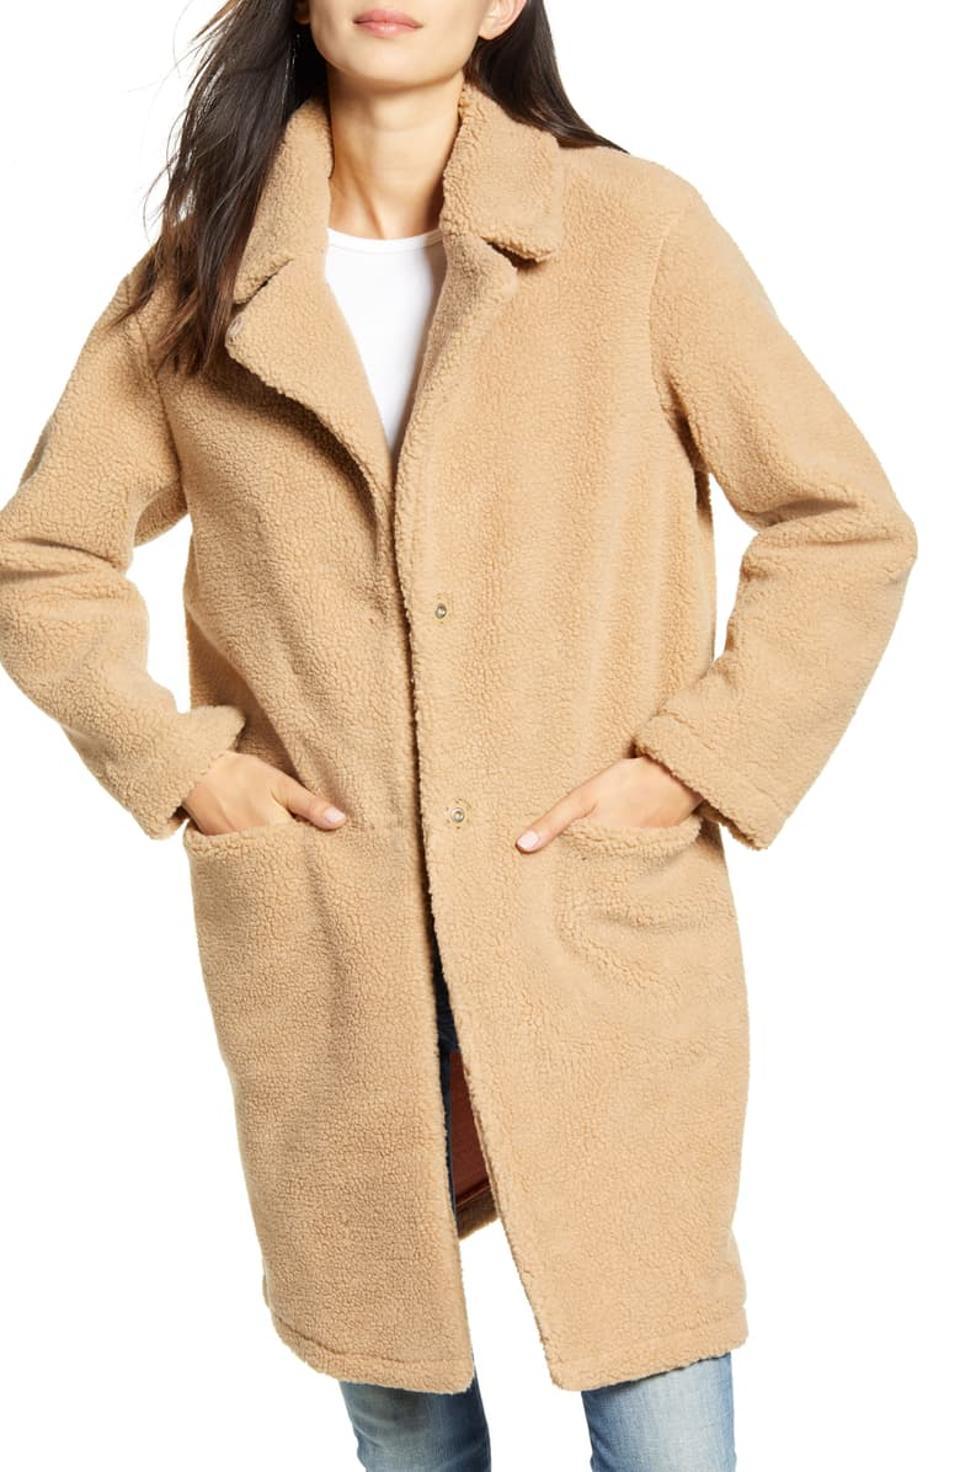 SCOTCH & SODA Teddy Coat